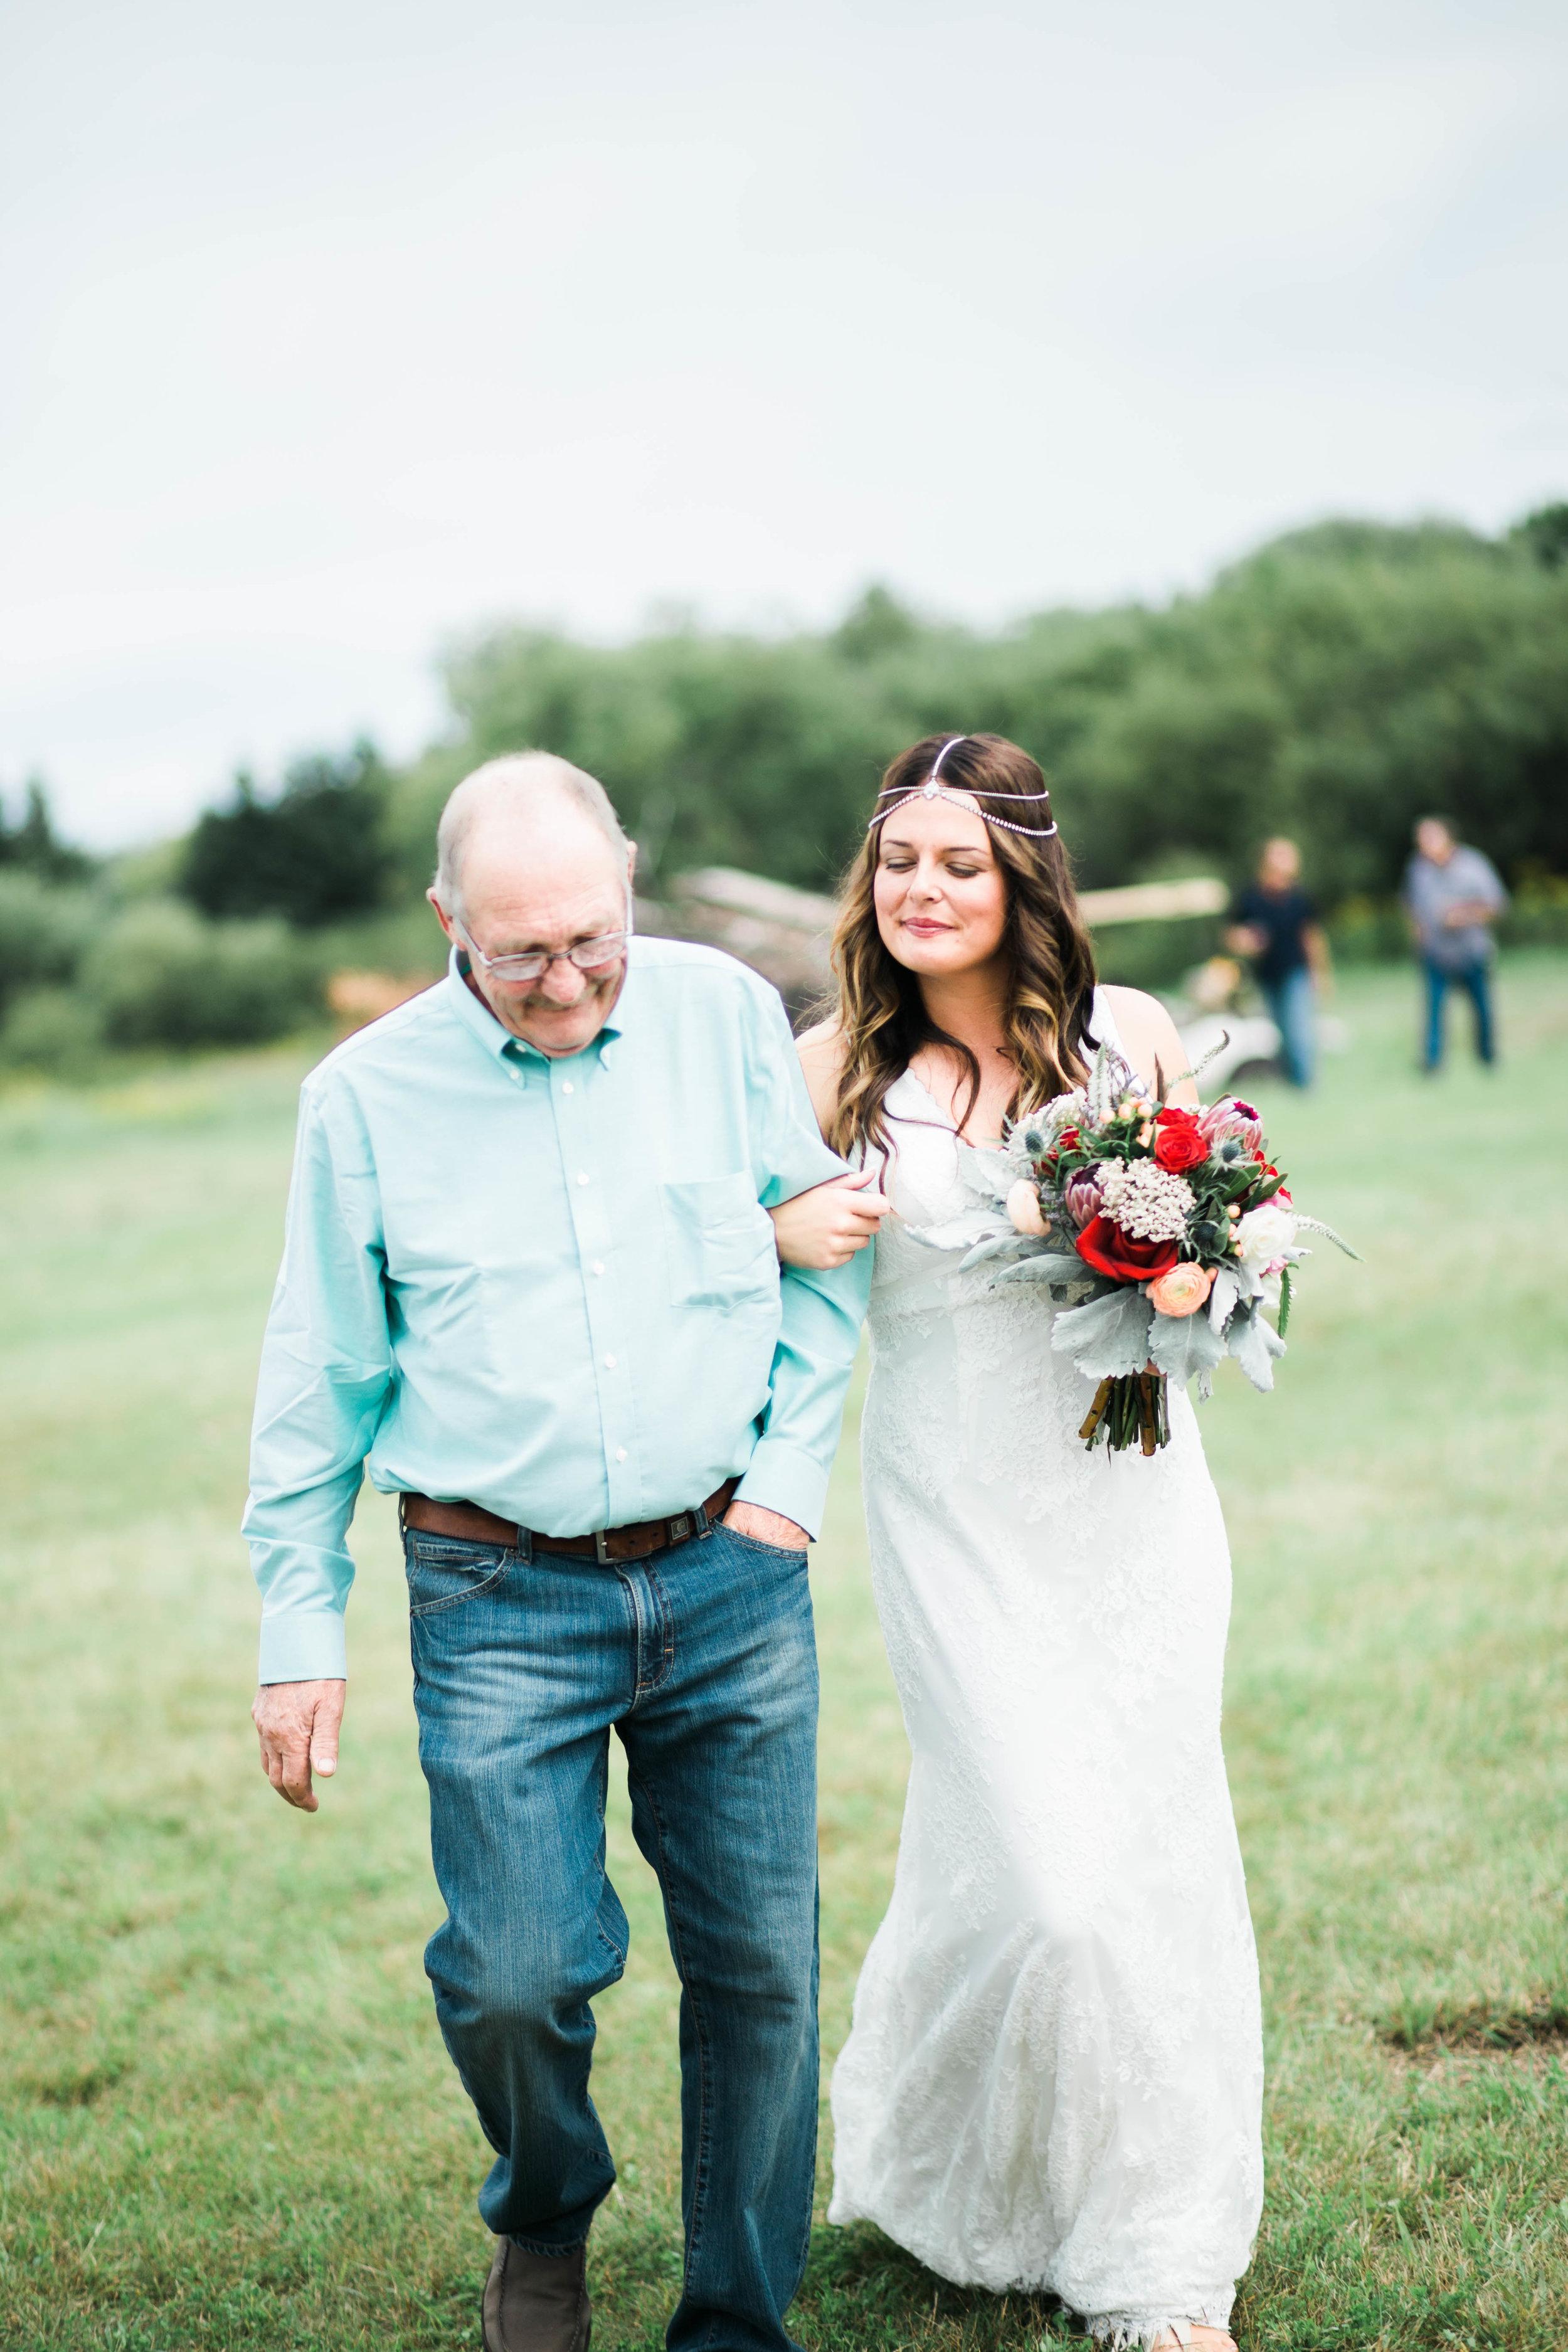 Bohemian Wedding - Sabrina Leigh Studios - Northern Michigan Wedding Photographer043.jpg